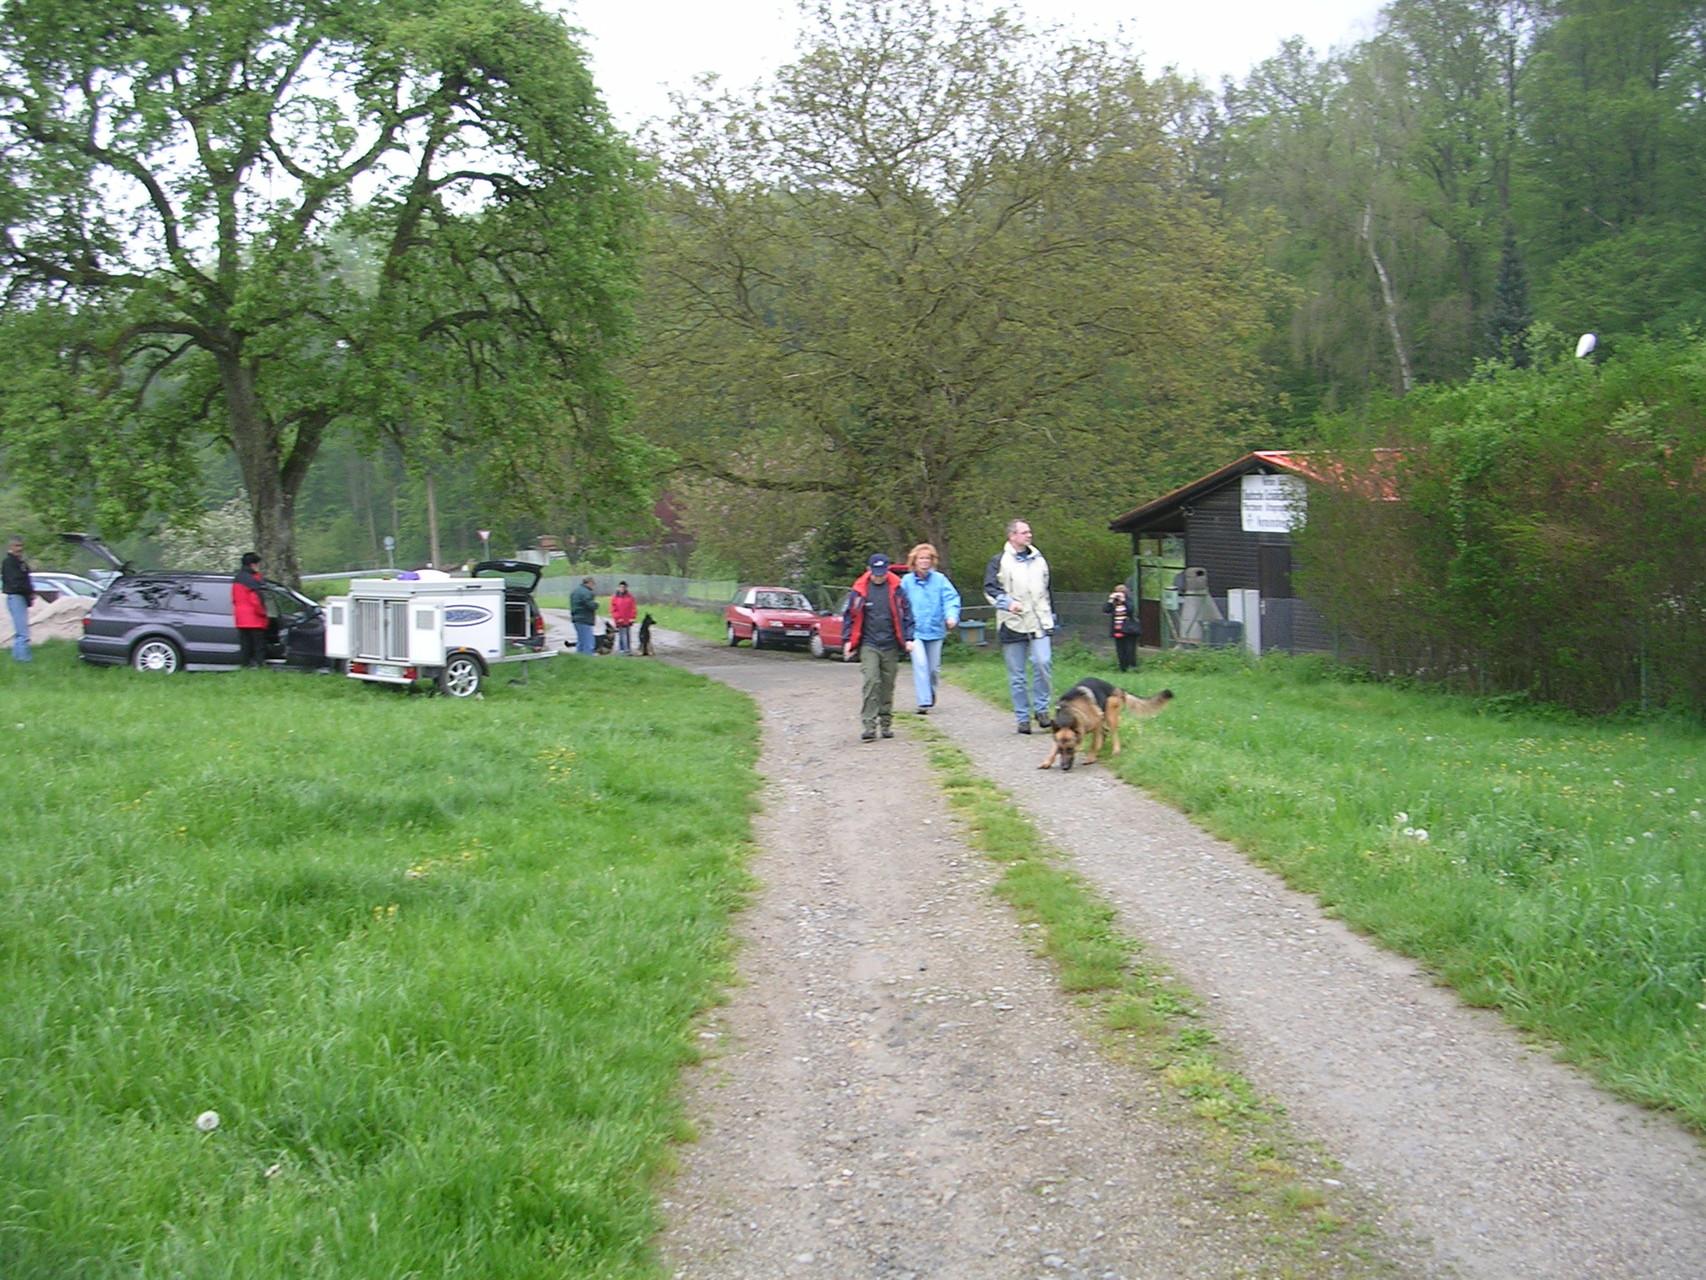 Wanderung Himmelfahrt 2005 mit anschließendem Forellenessen